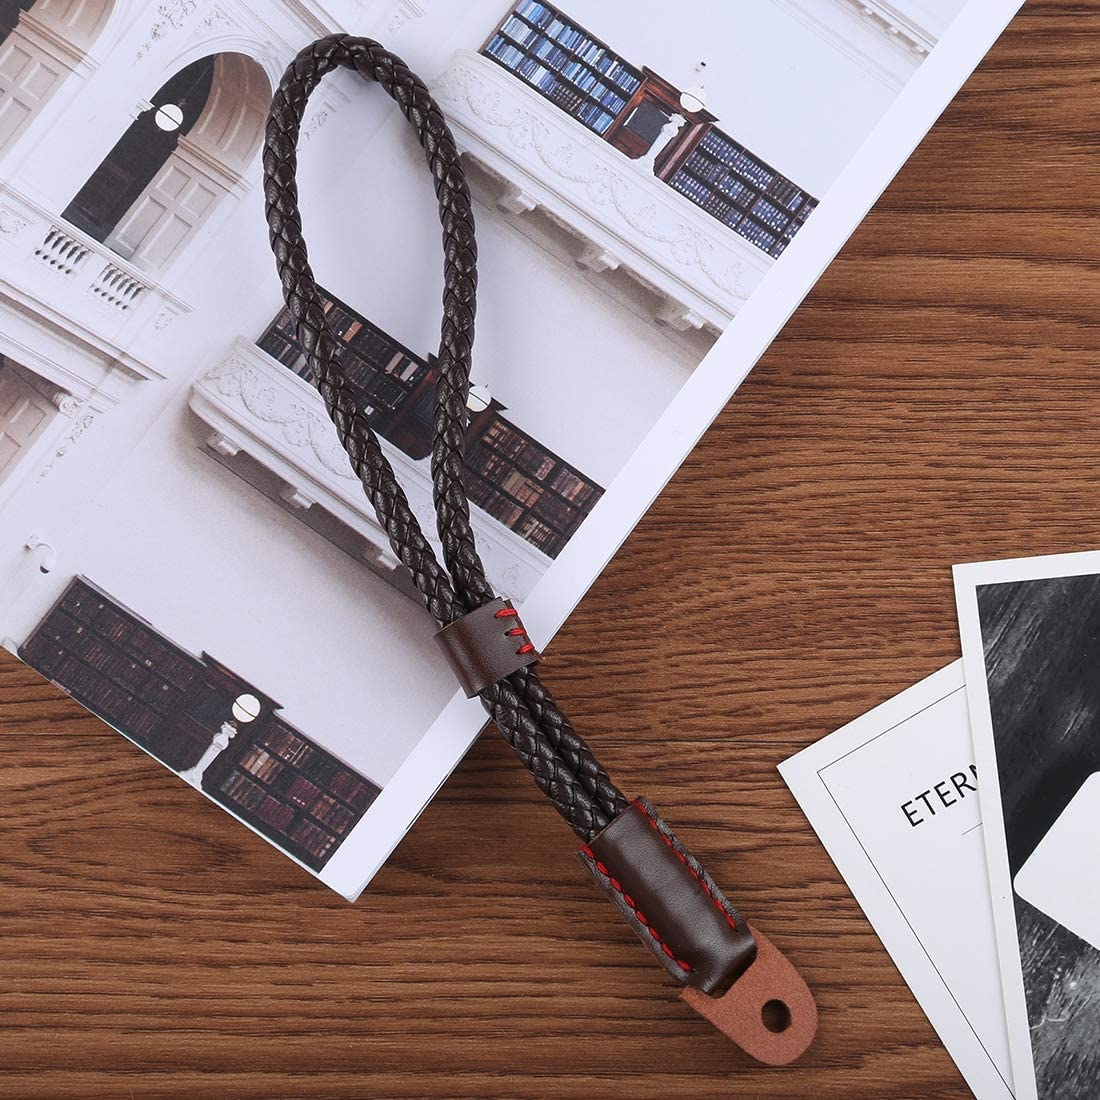 YANTAIANJANE Camera Accessories Wrist Strap Grip PU Leather Hand Strap for SLR//DSLR Cameras Color : Coffee Black